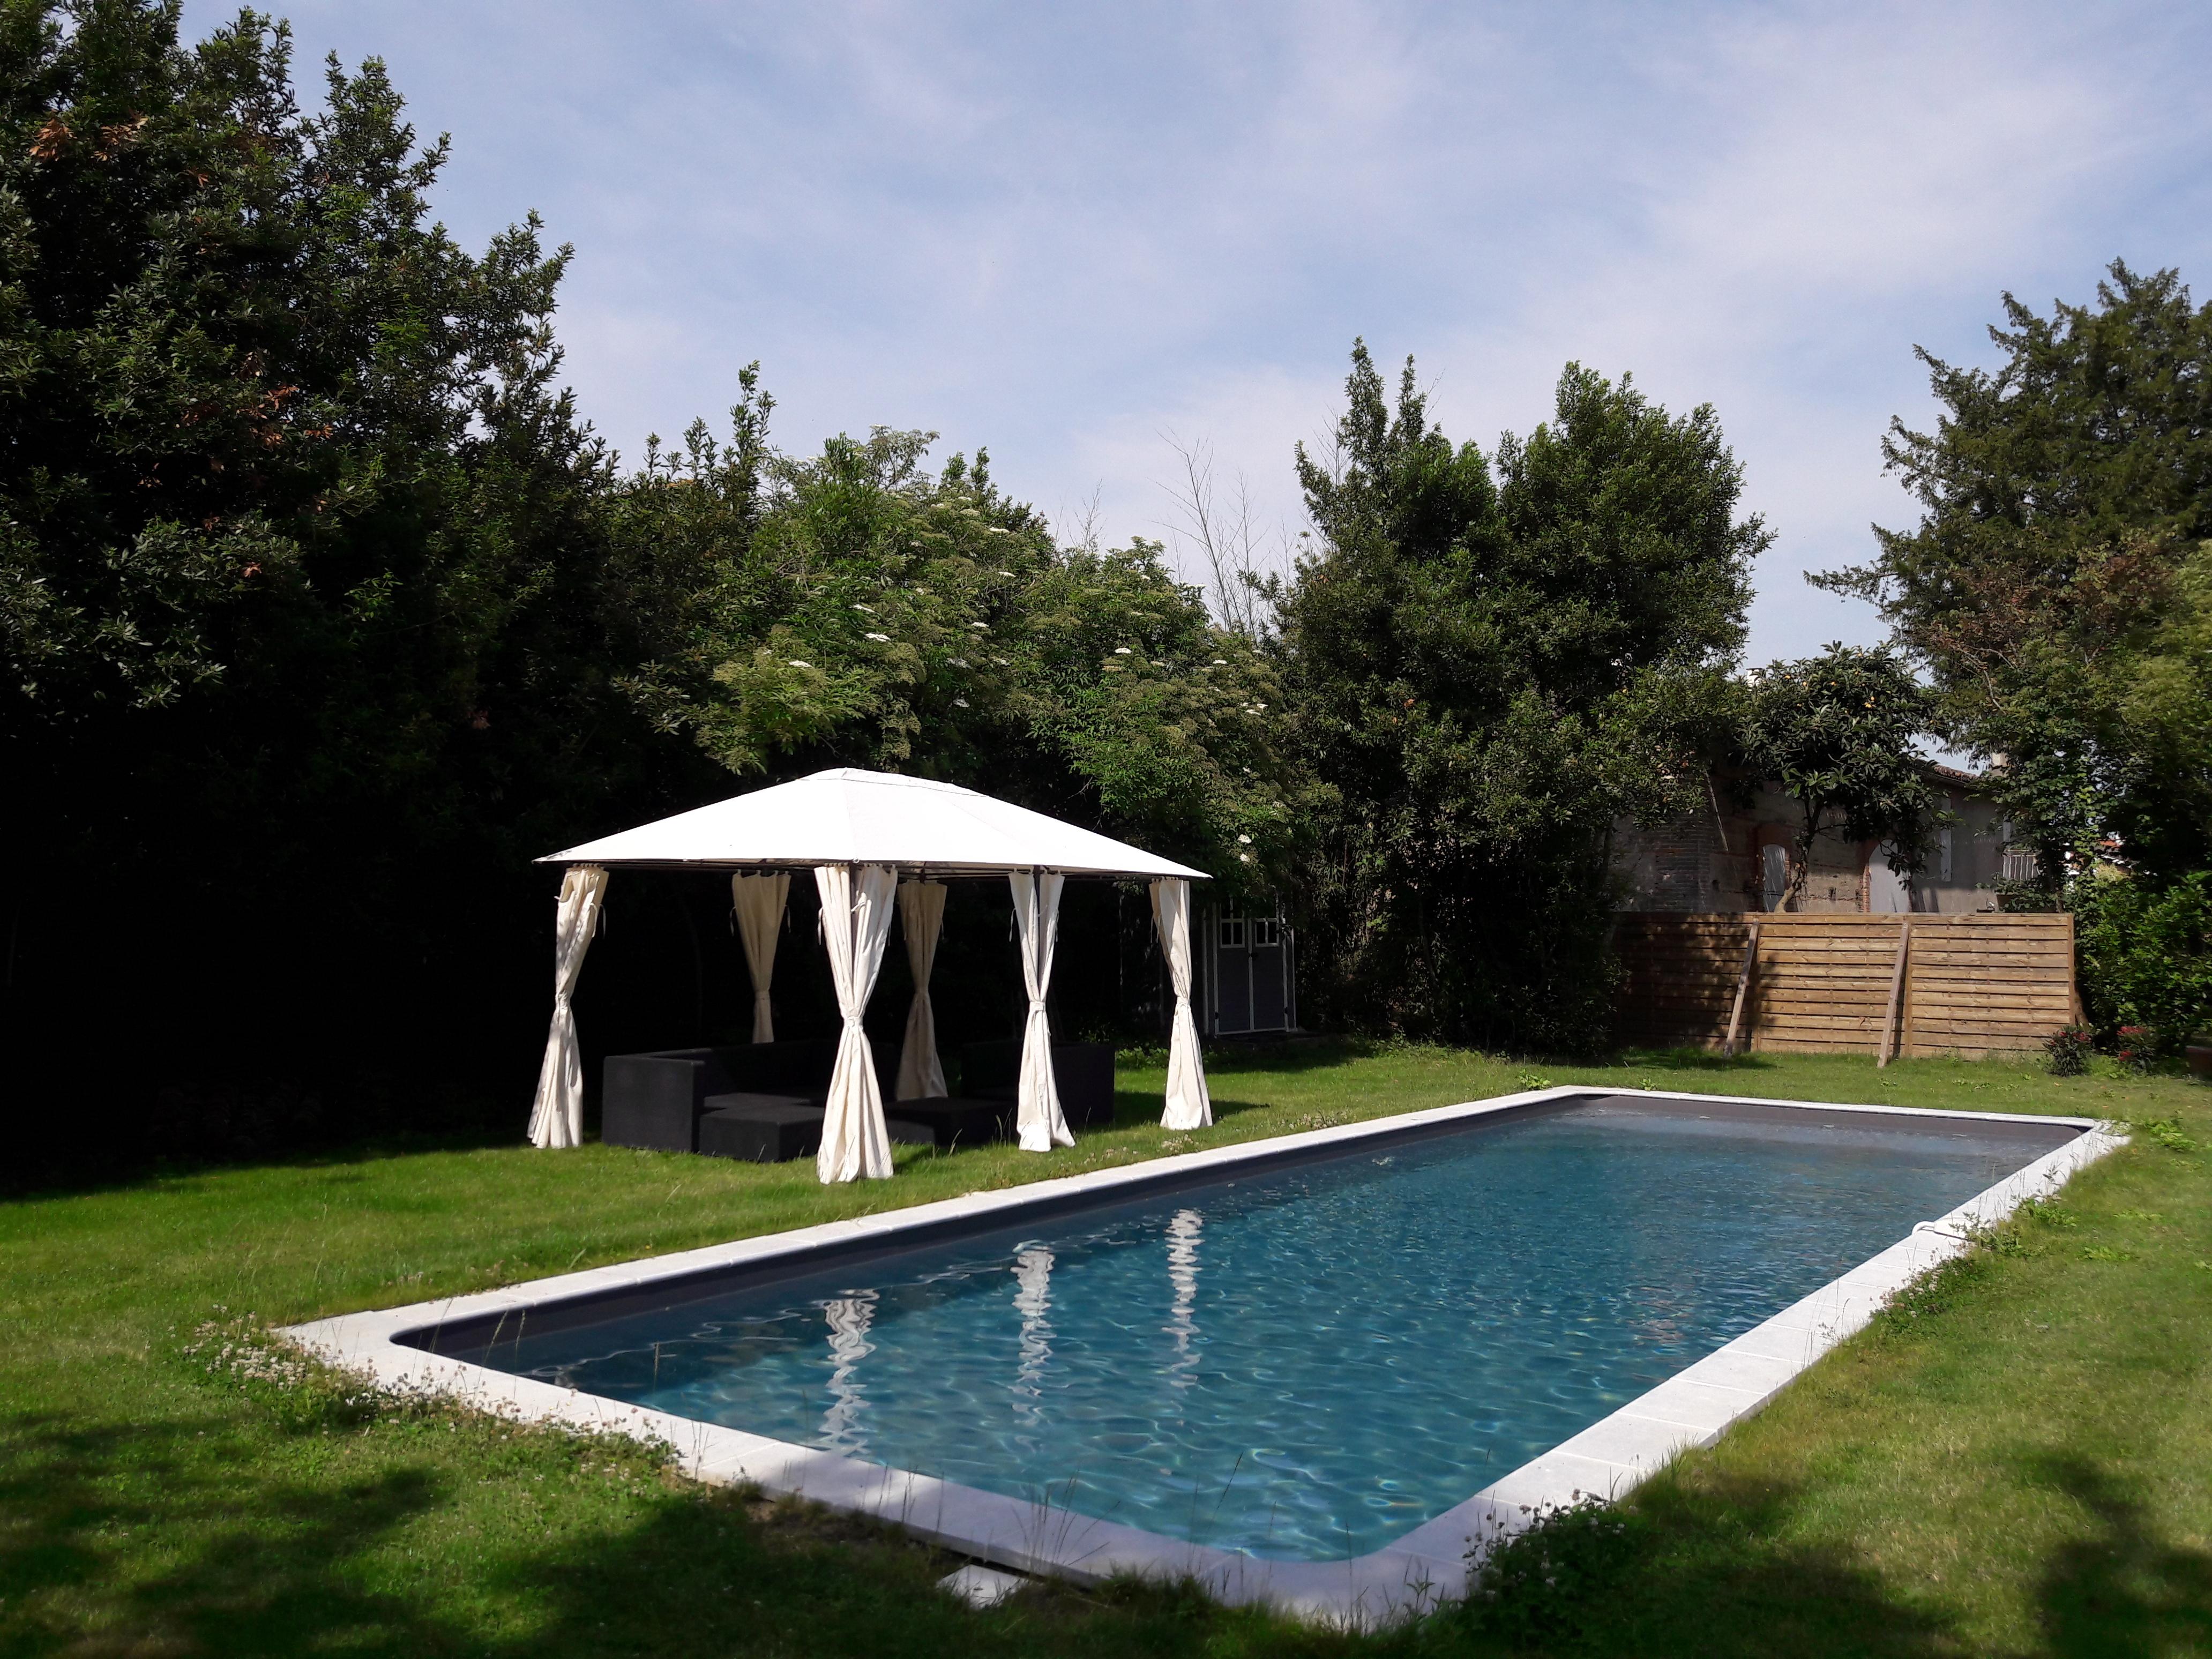 chambres d'hotes avec piscine